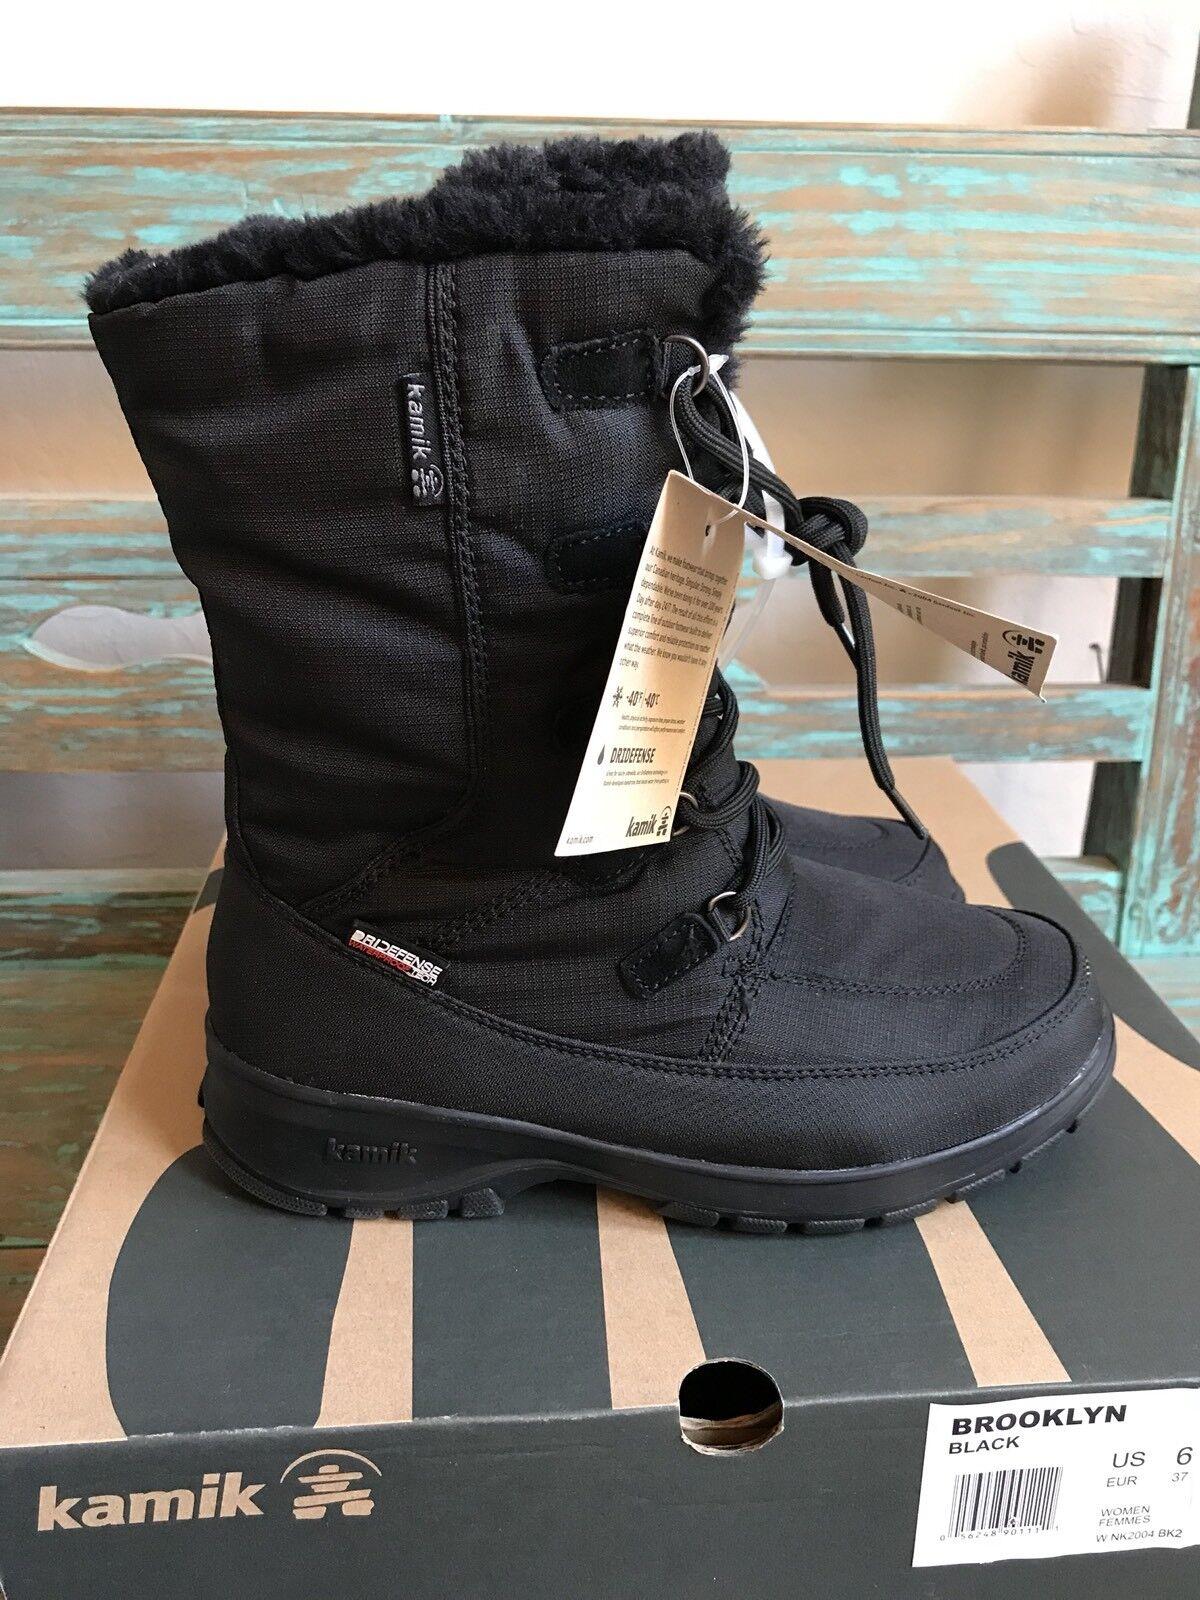 Kamik Nylon BROOKLYN Waterproof Snow Stiefel Nylon Kamik Winter Lace-Up Damens's 3c6561